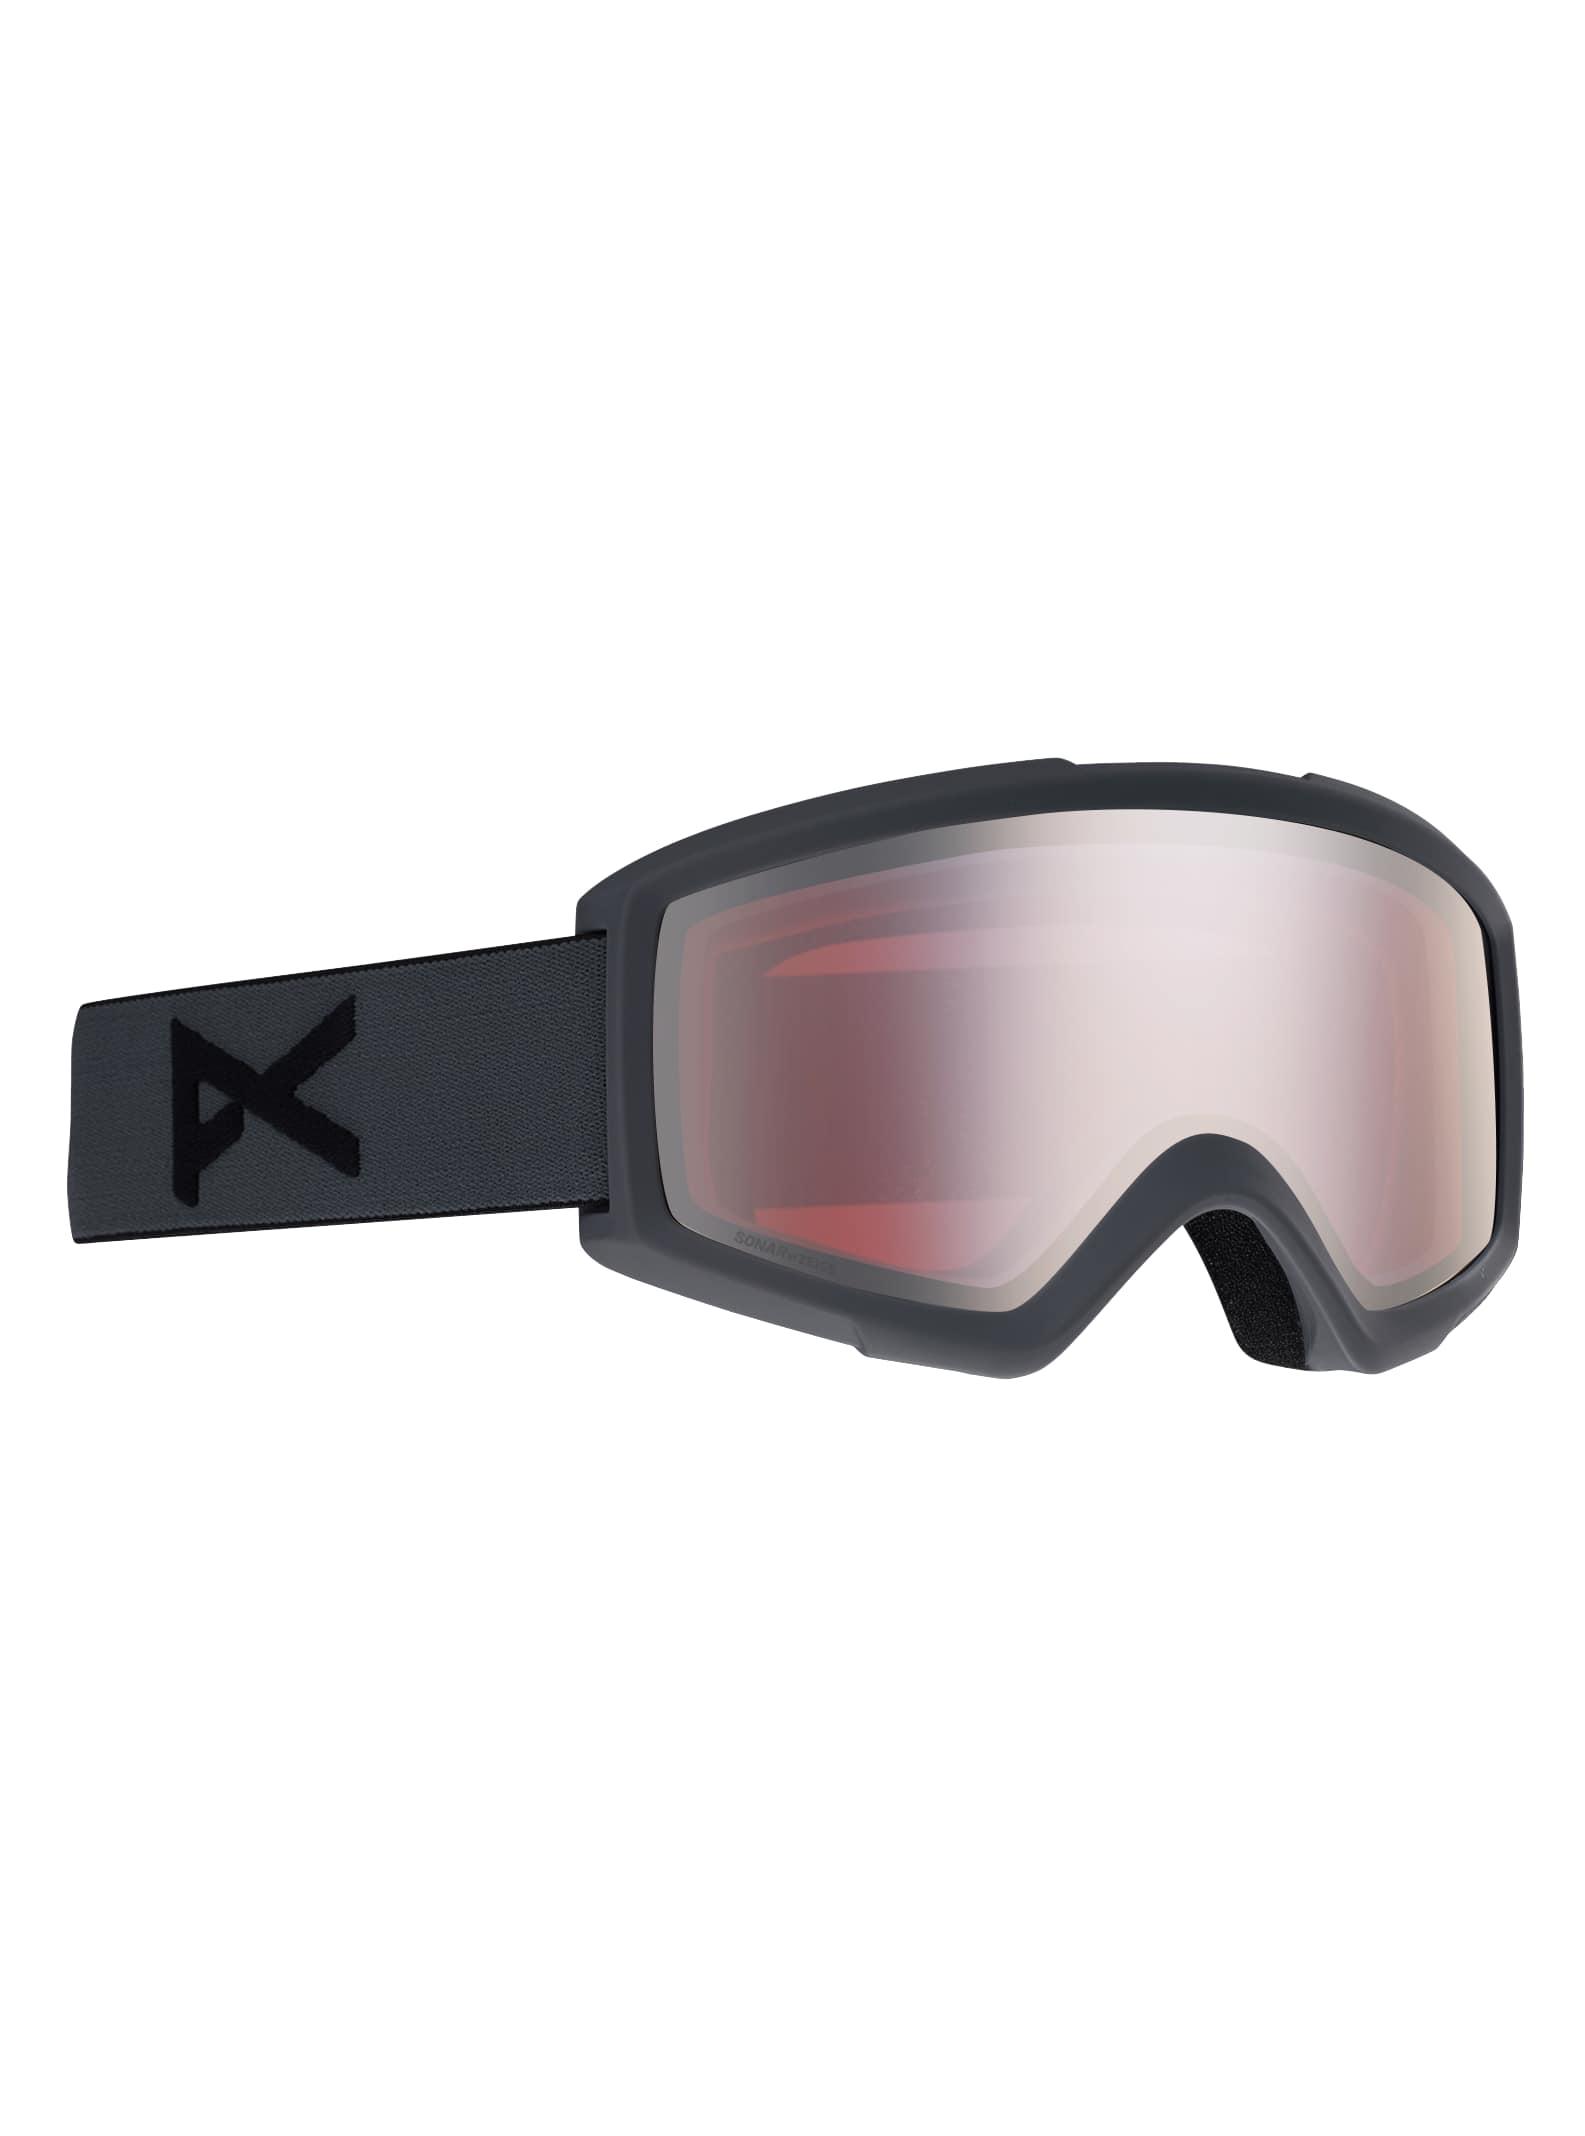 Anon Men's Helix 2.0 Sonar Goggle + Spare Lens, Frame: Stealth, Lens: SONAR Silver, Spare Lens: Ambe